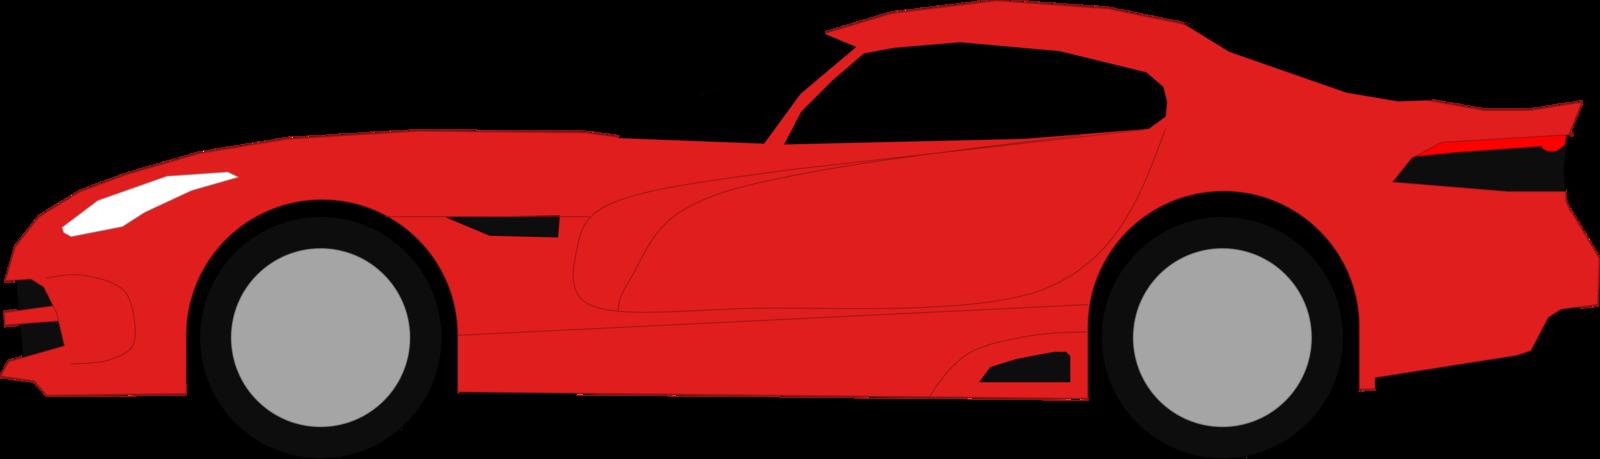 Clipart cars barracuda. Slash xt by coulden